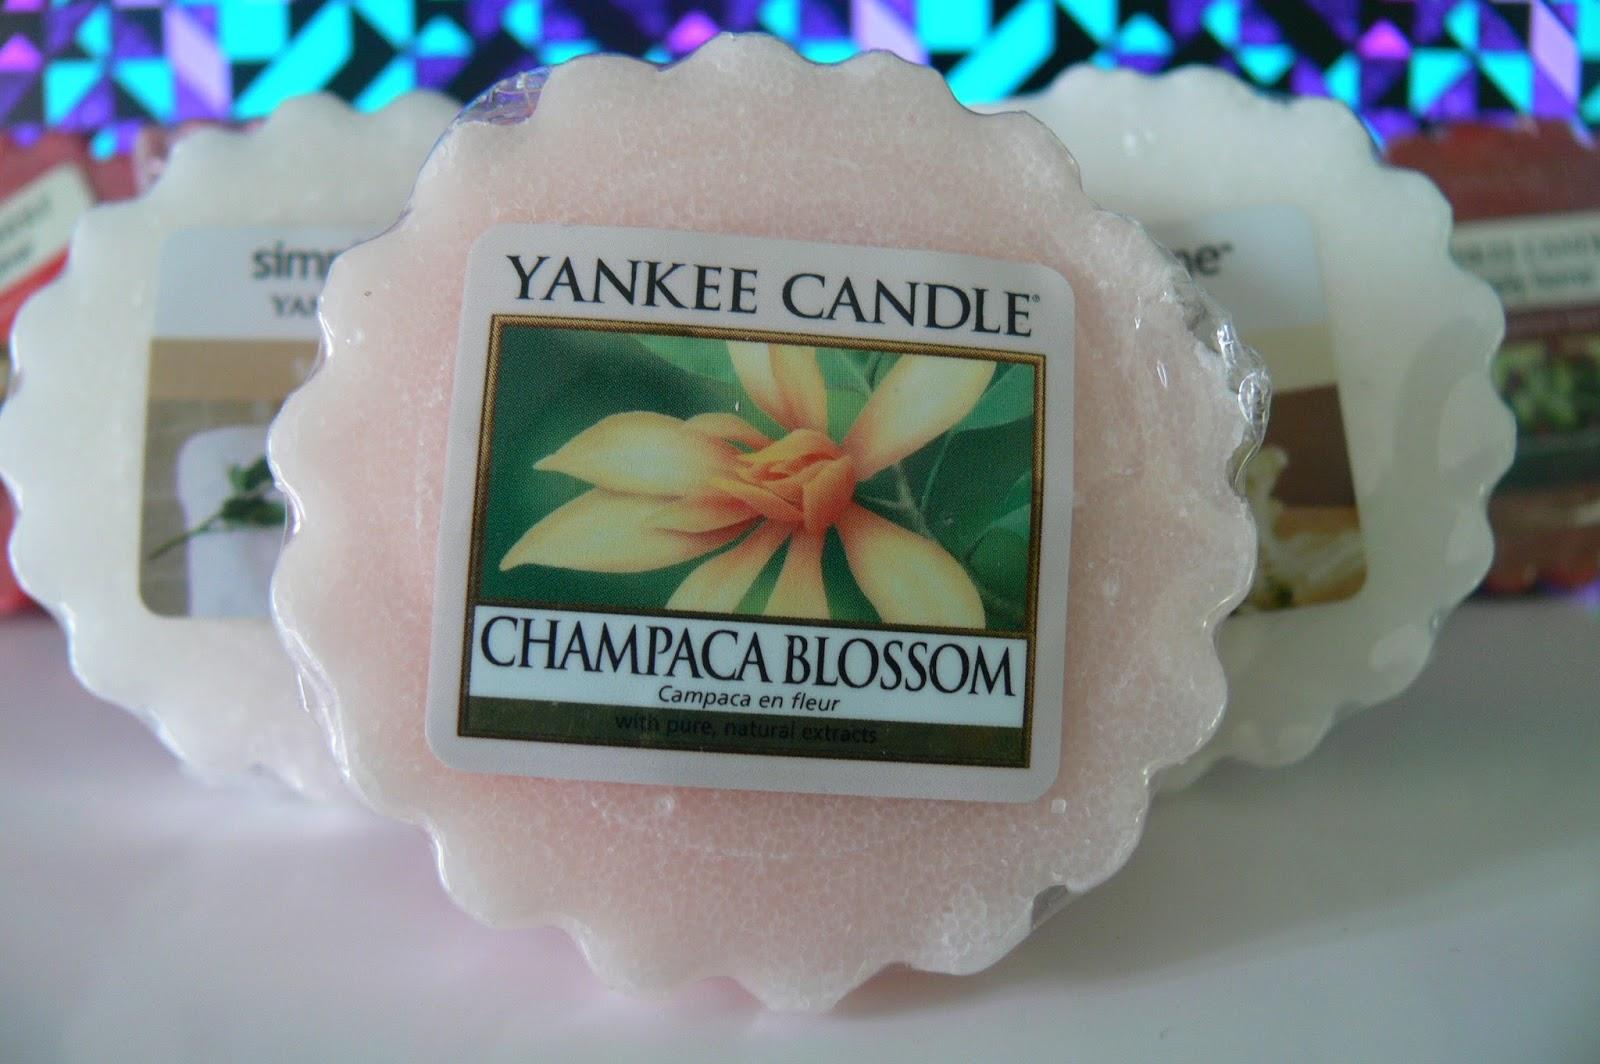 Yankee Candle Champaca Blossom